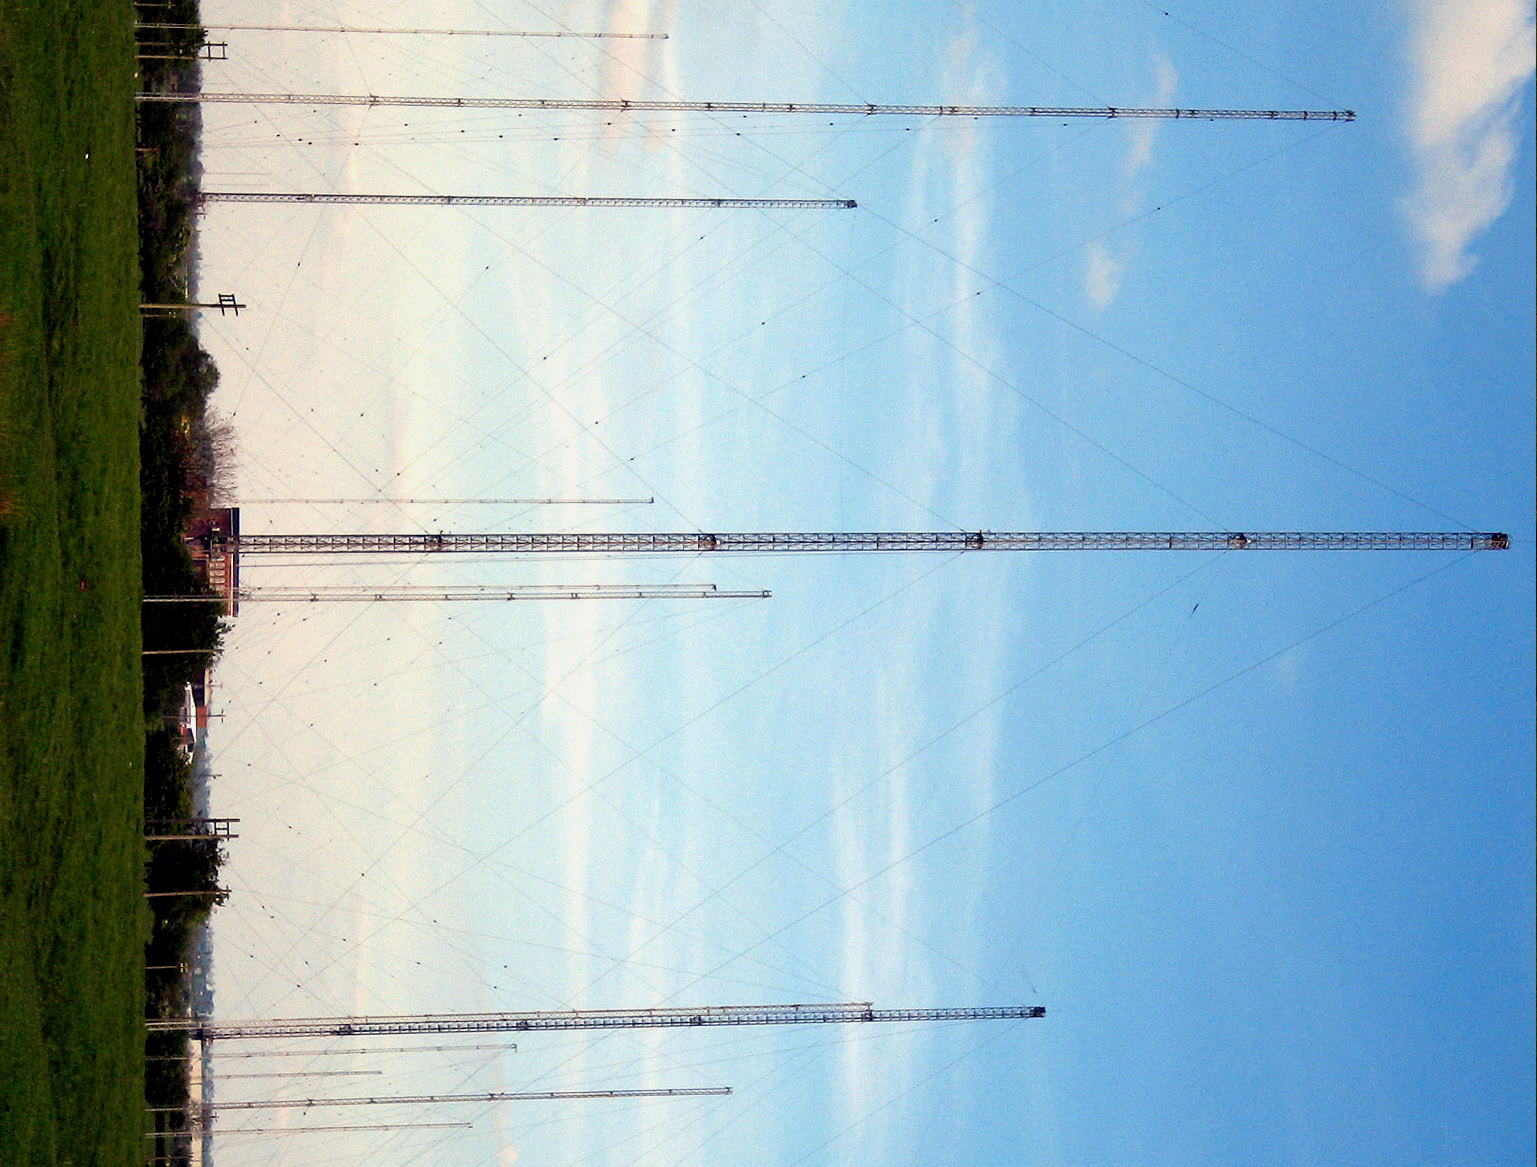 Radio masts and towers - Wikiwand